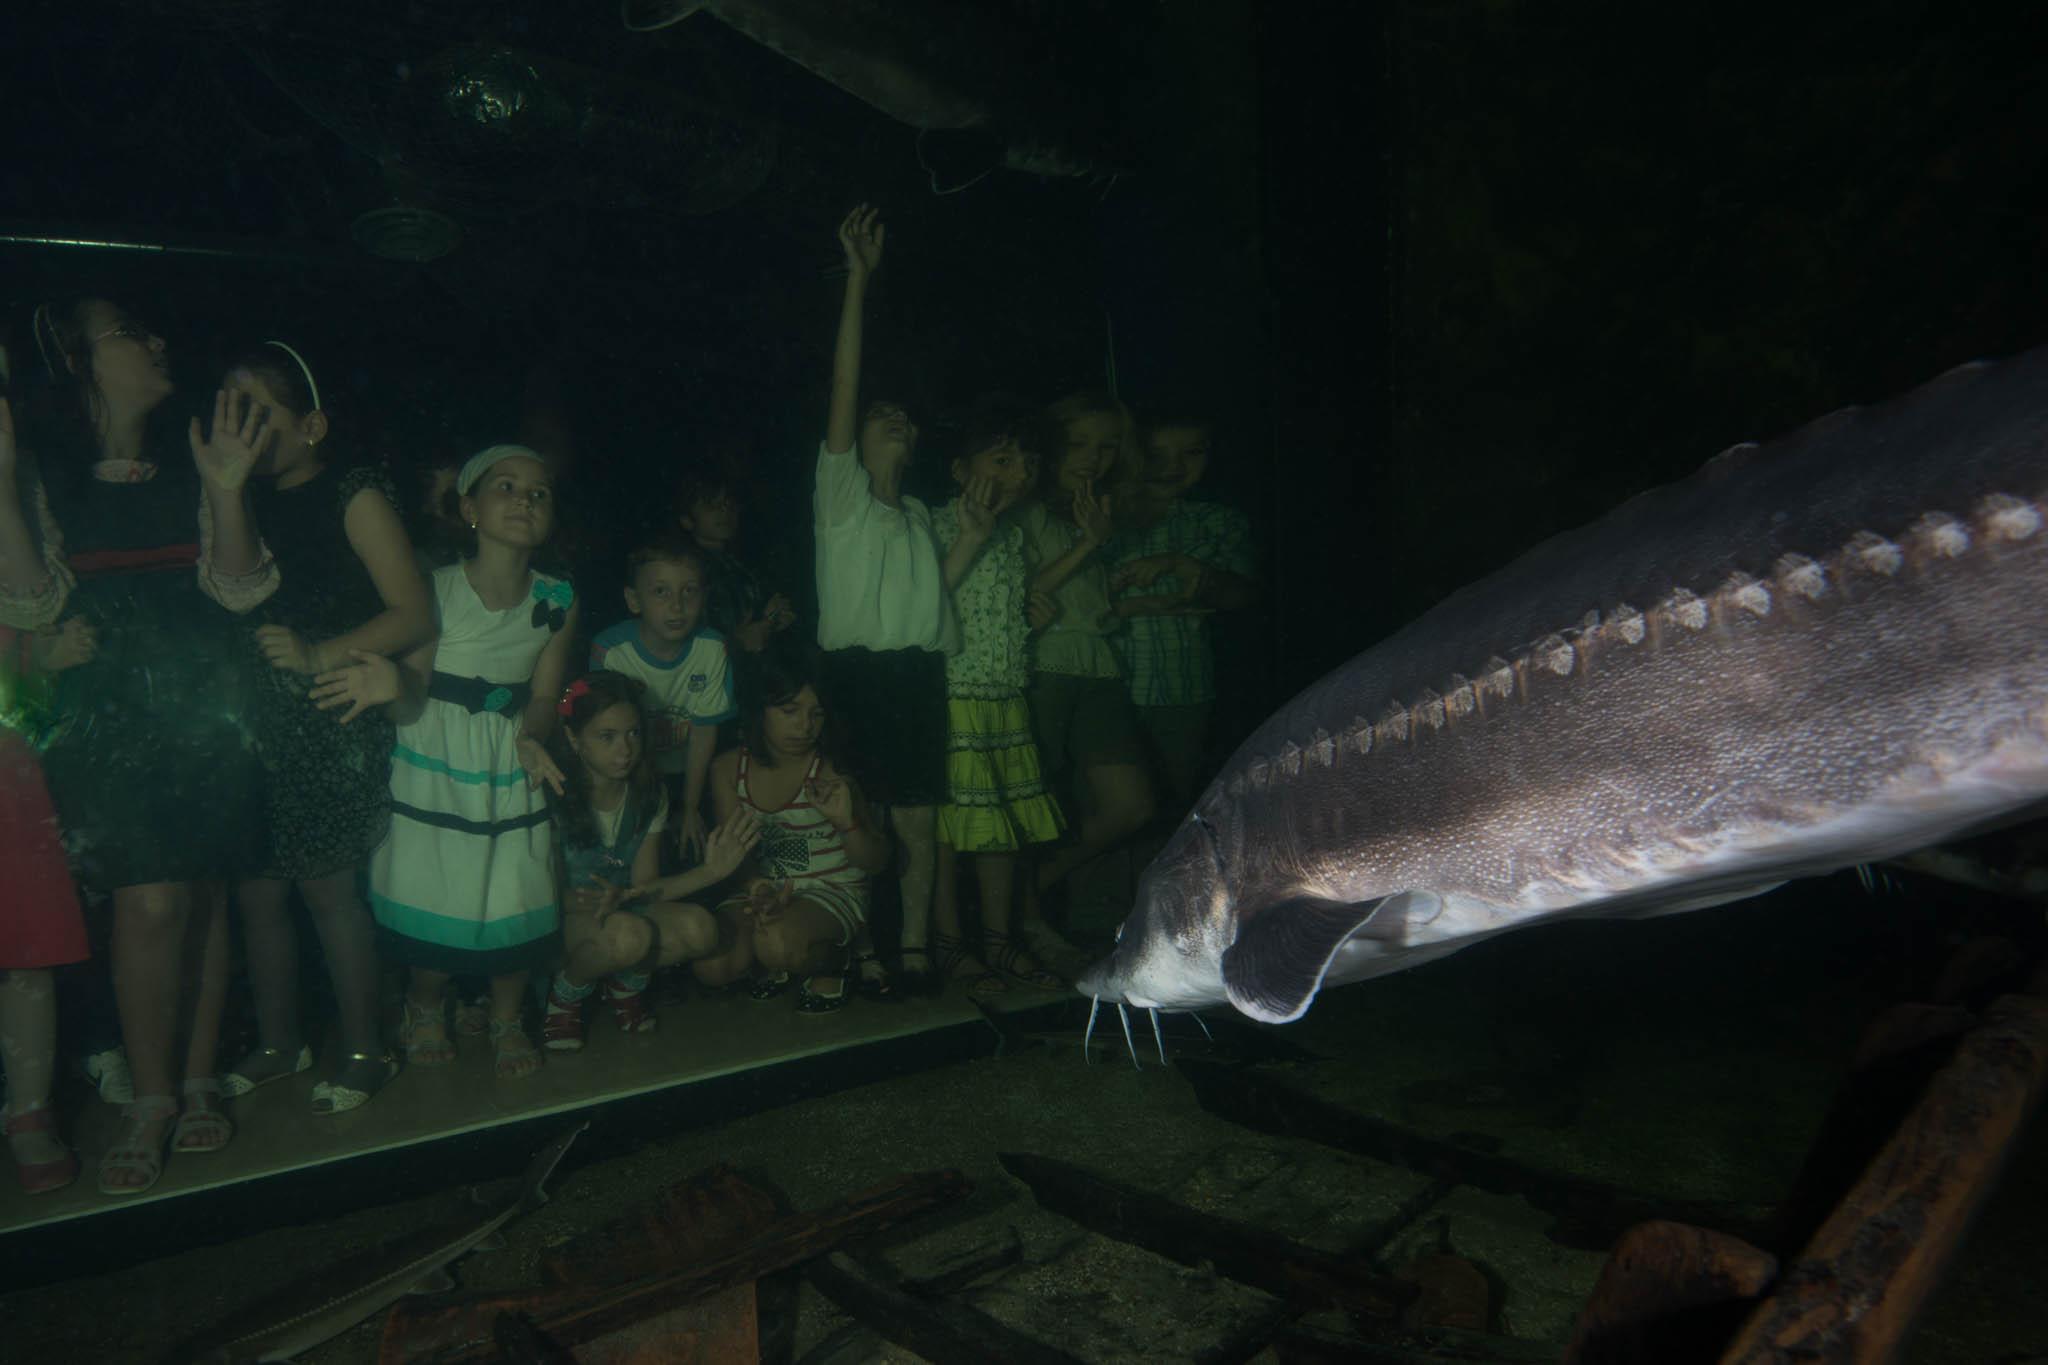 Spectators looking at the beluga, sometimes called European sturgeon.